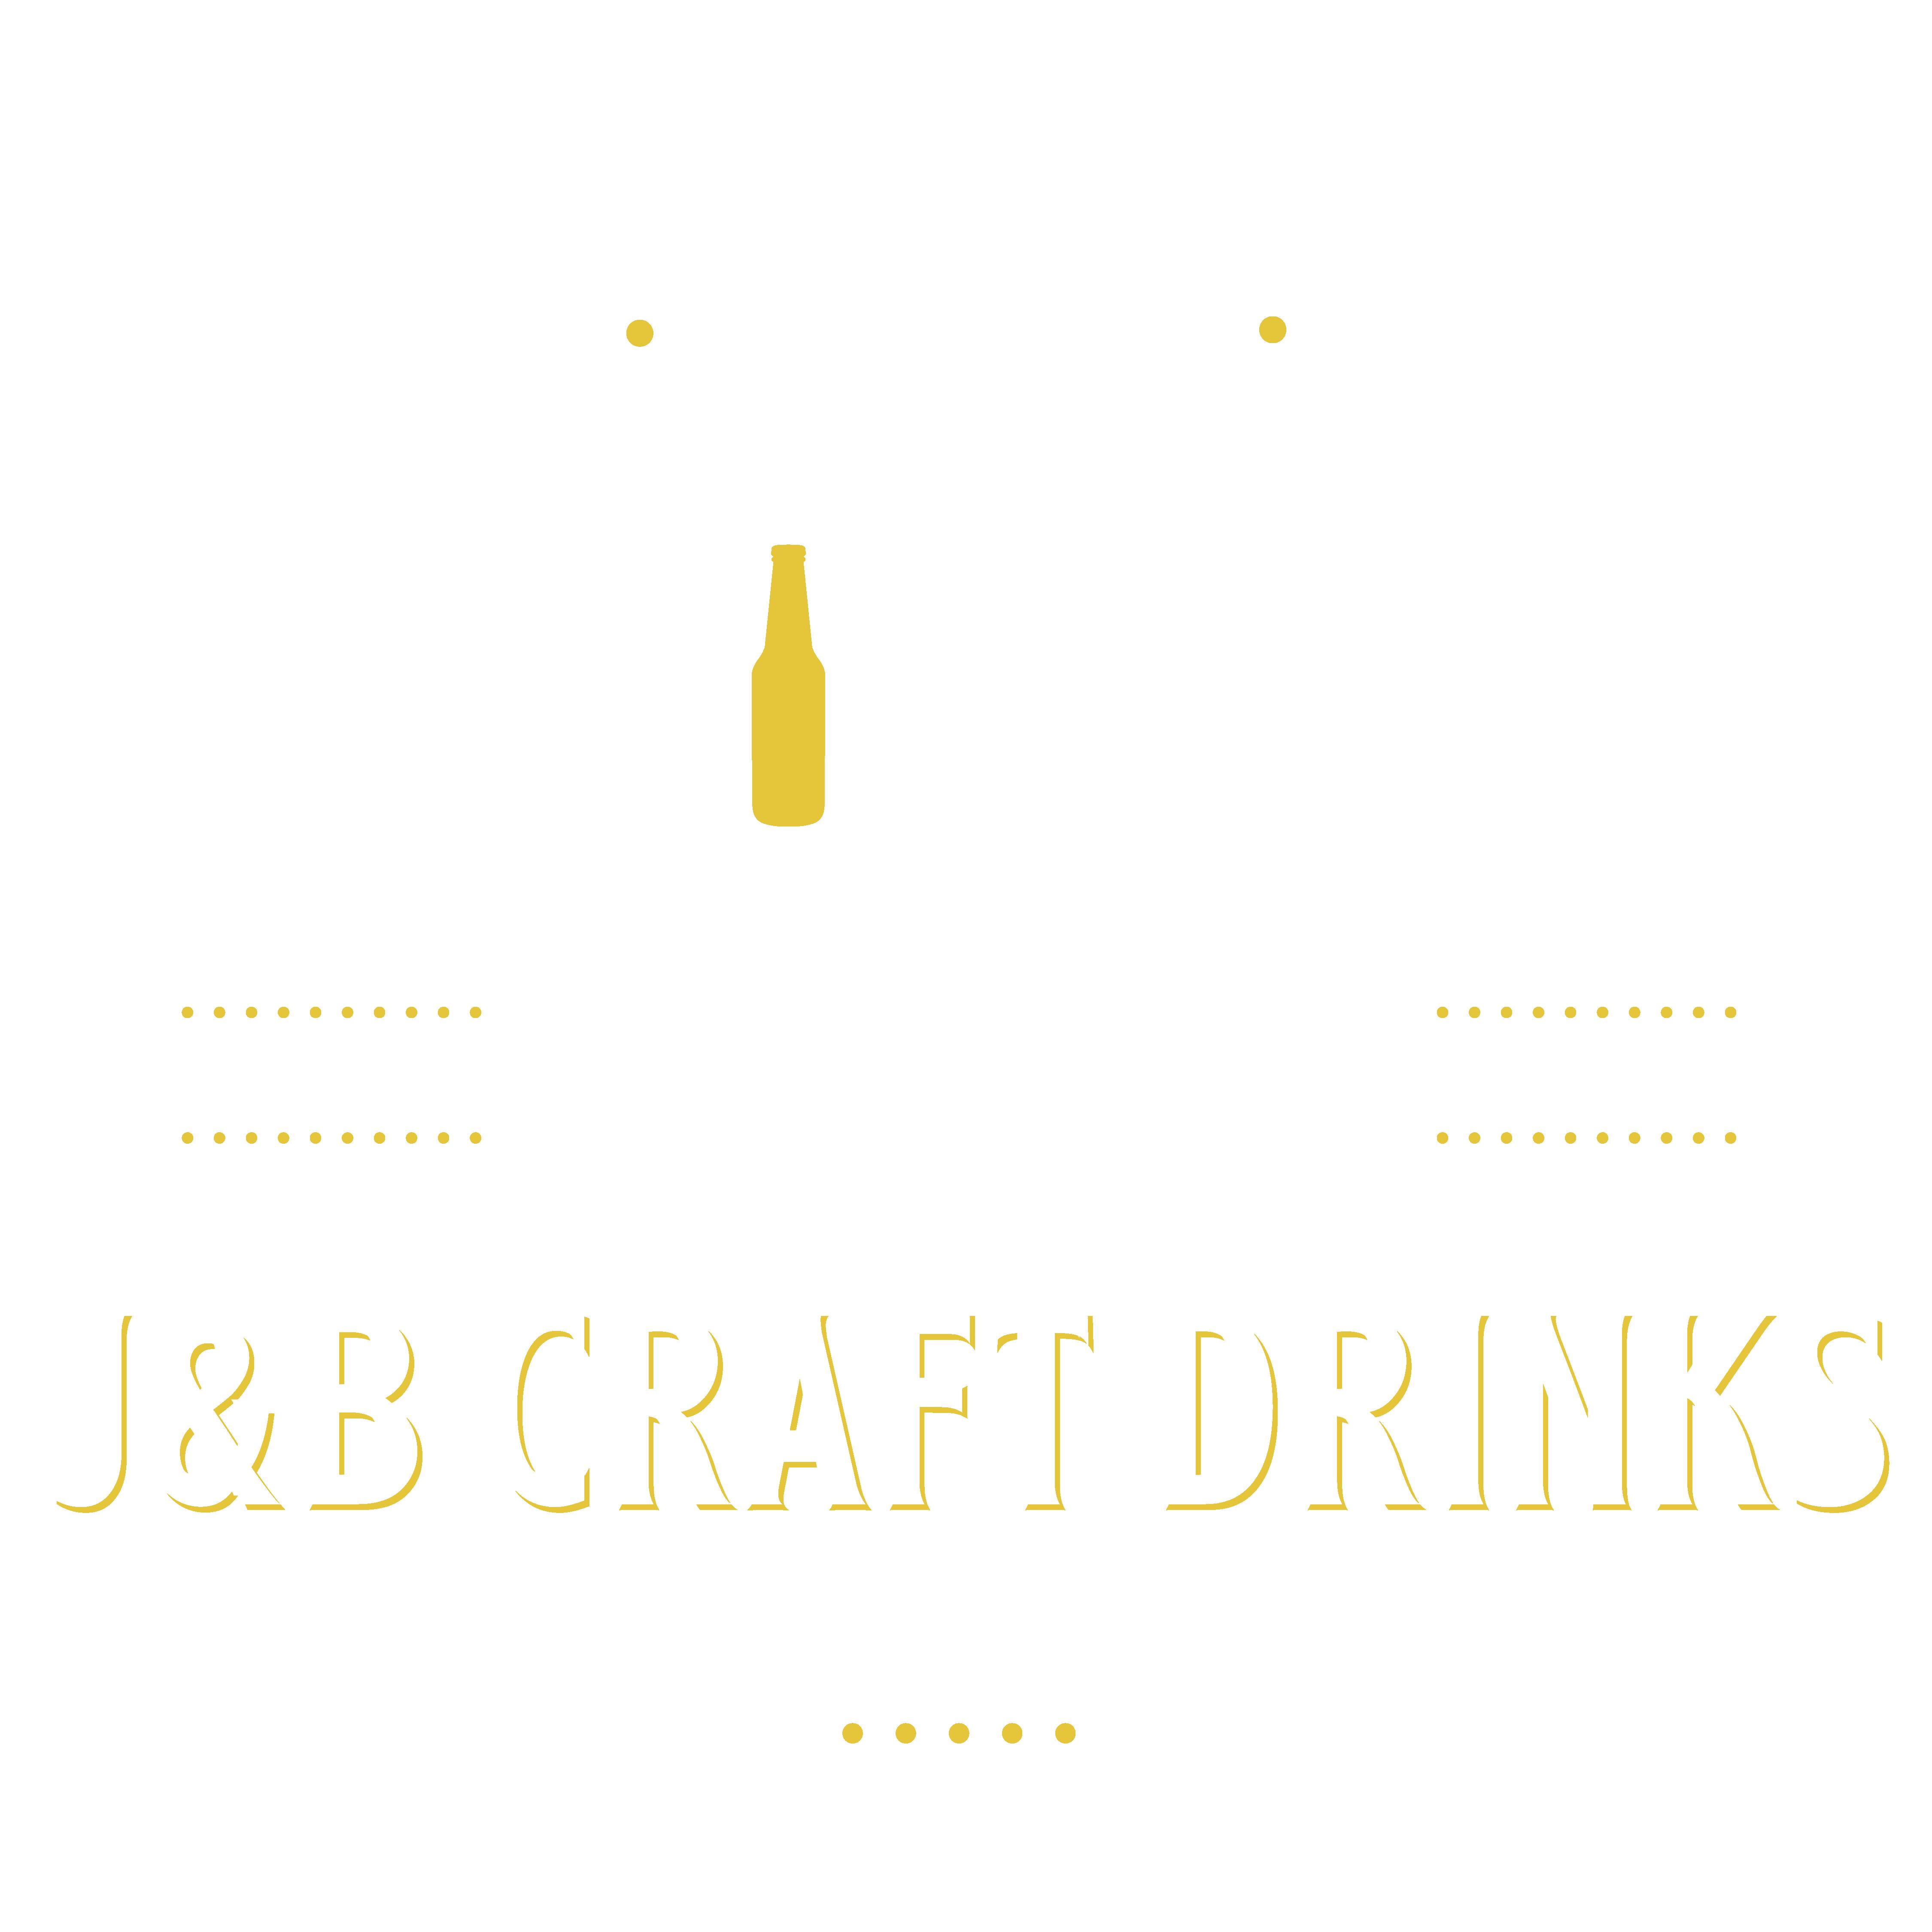 J&B Craft Distribution